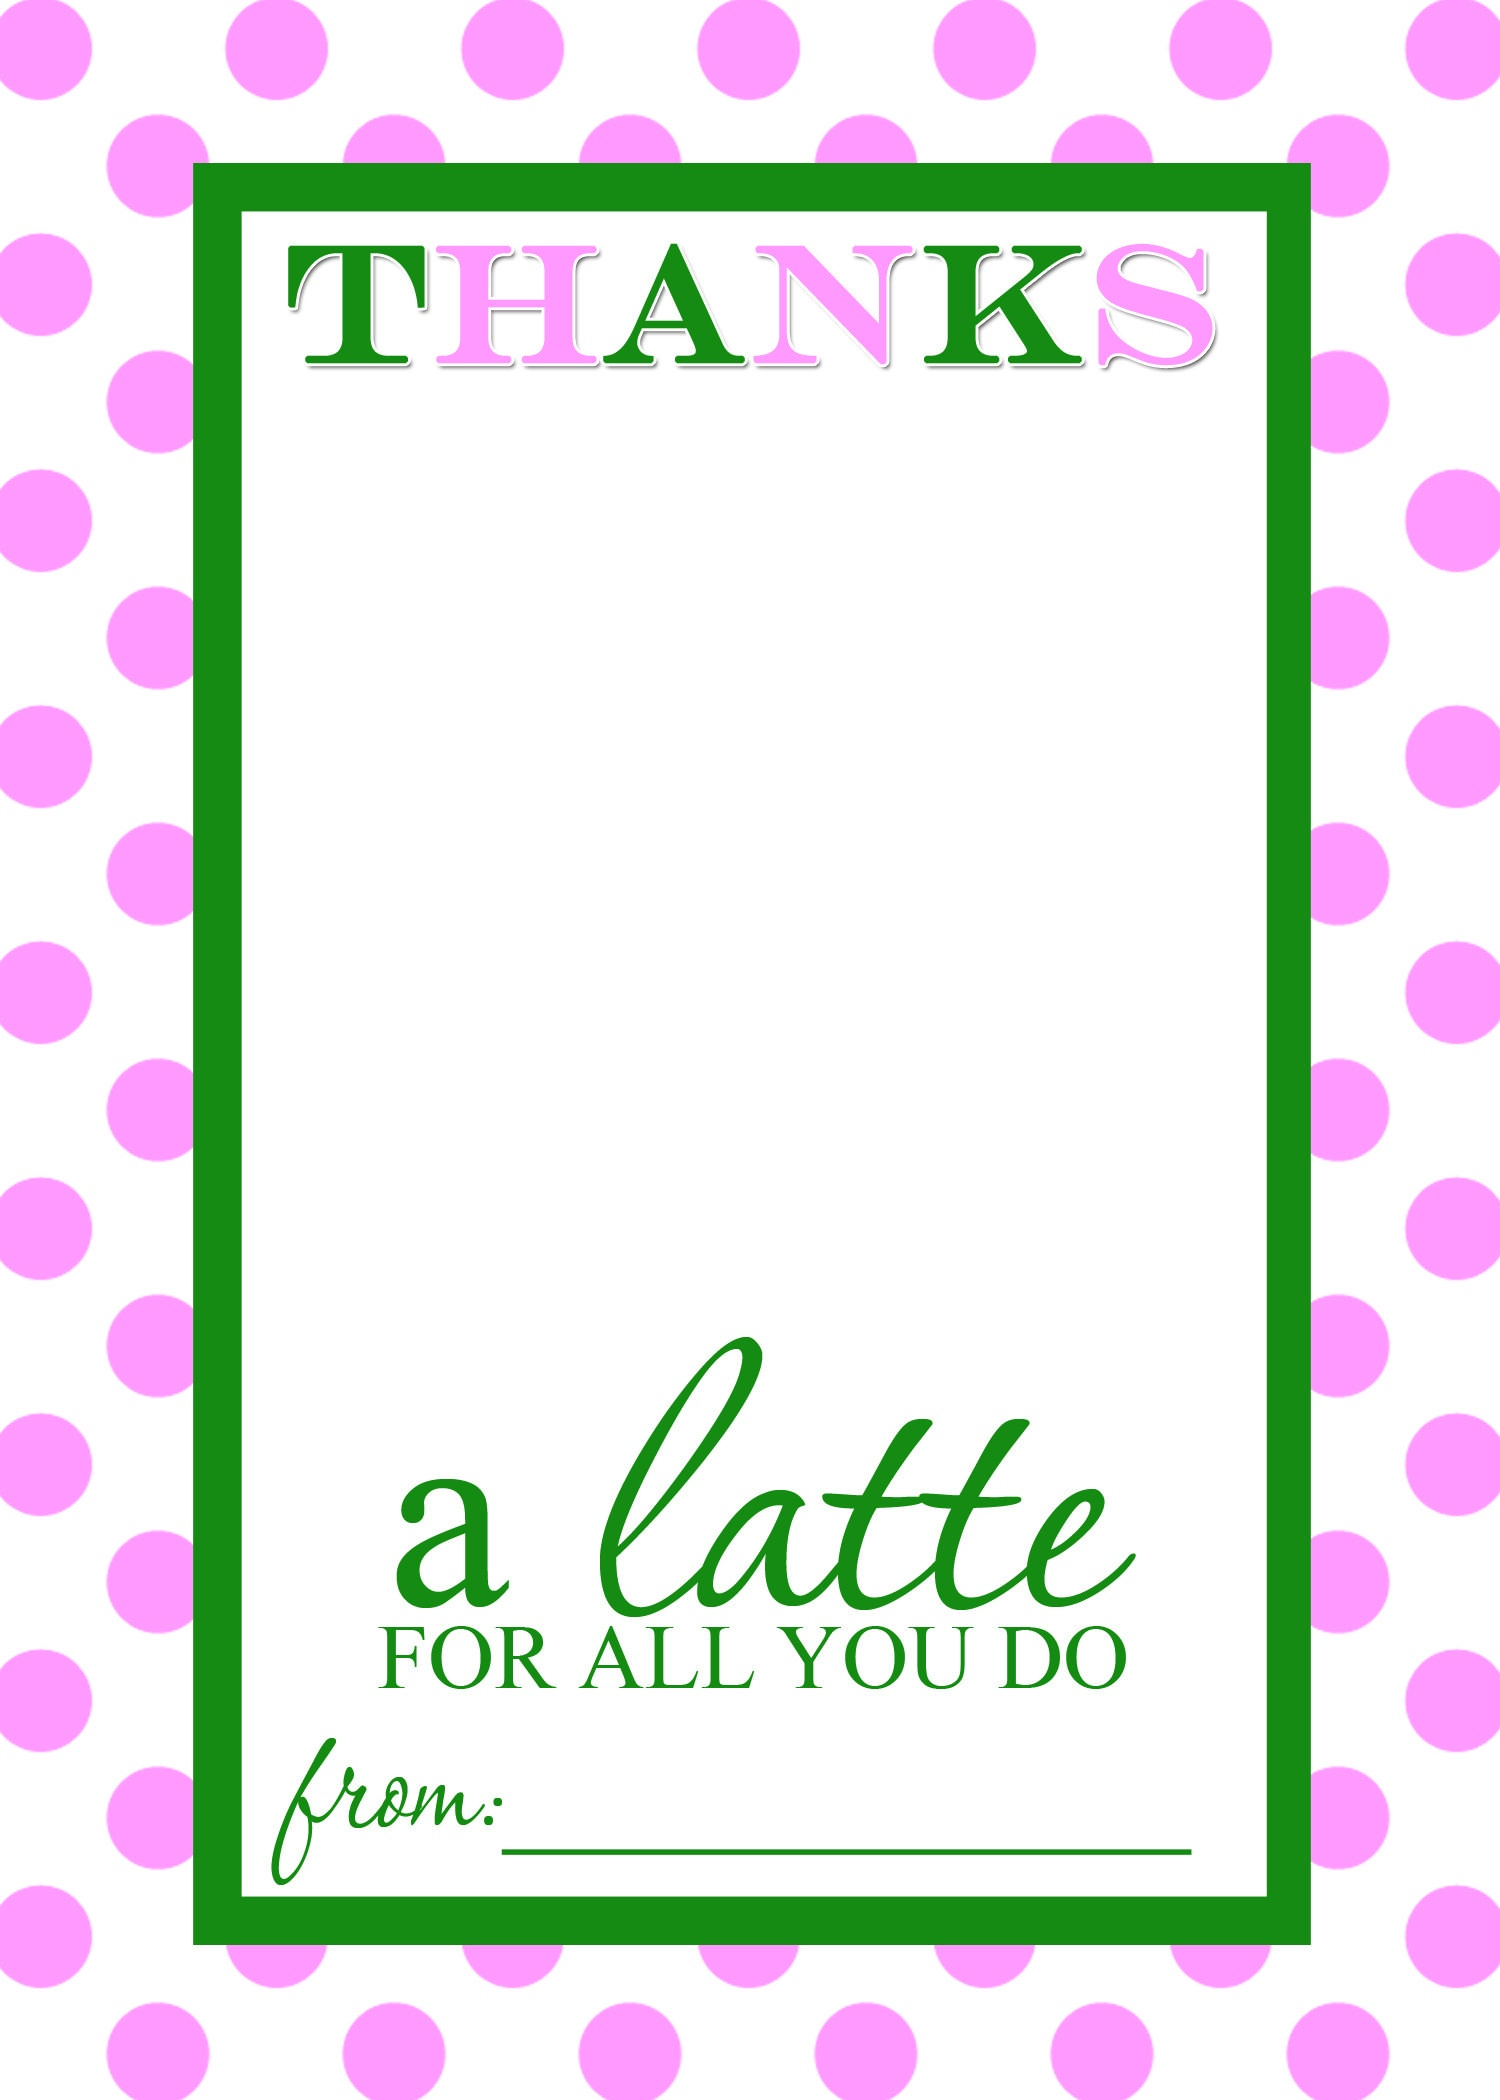 Thanks A Latte Free Printable Gift Card Holder Teacher Gift | Diy - Thanks A Latte Free Printable